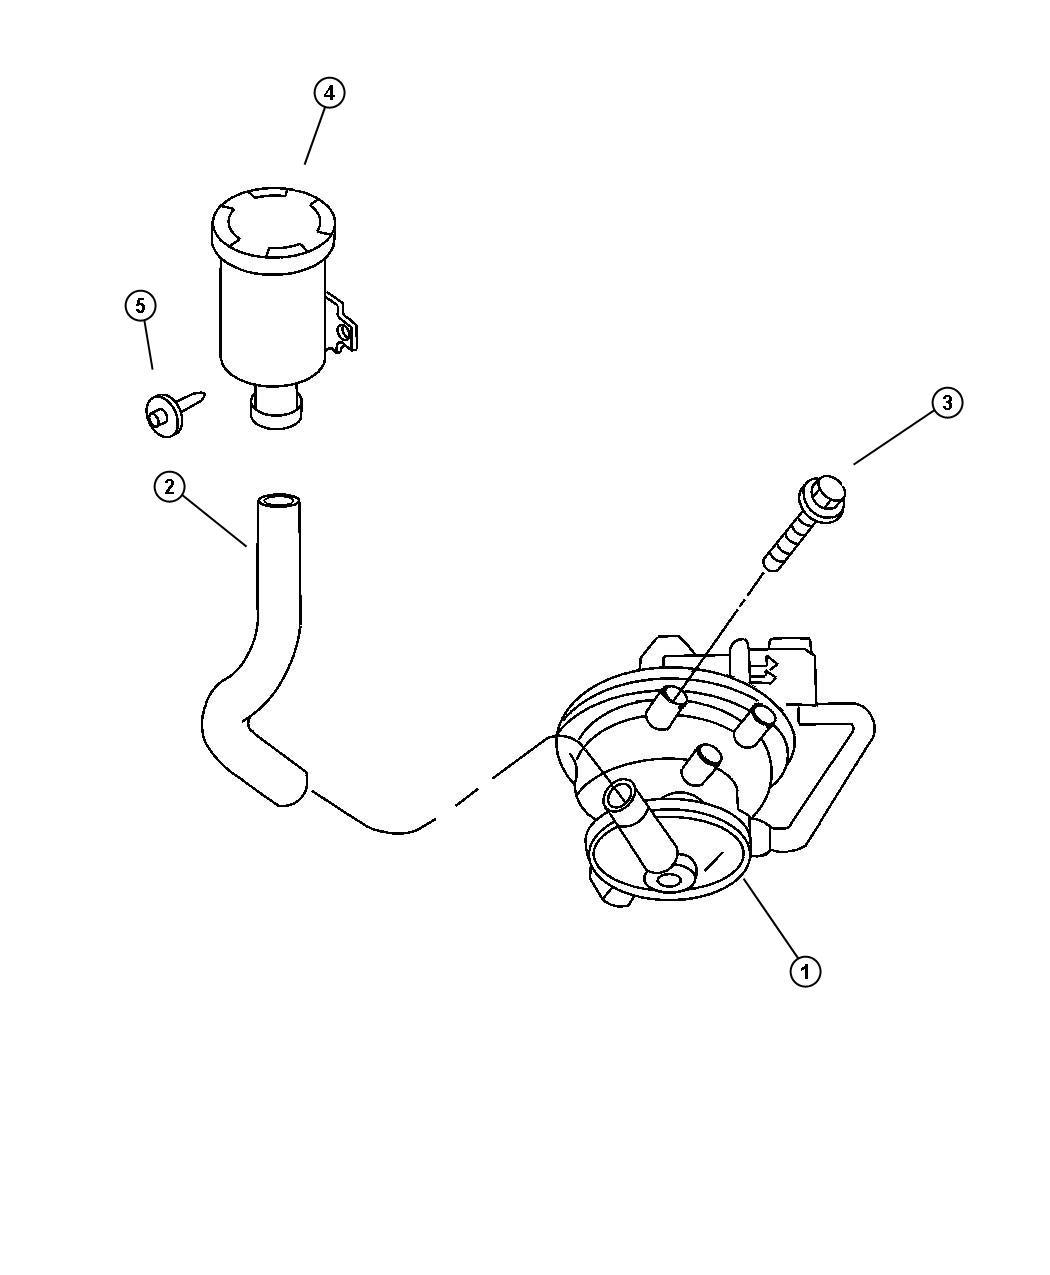 1999 Dodge Durango Fuel Filter Replacement Location